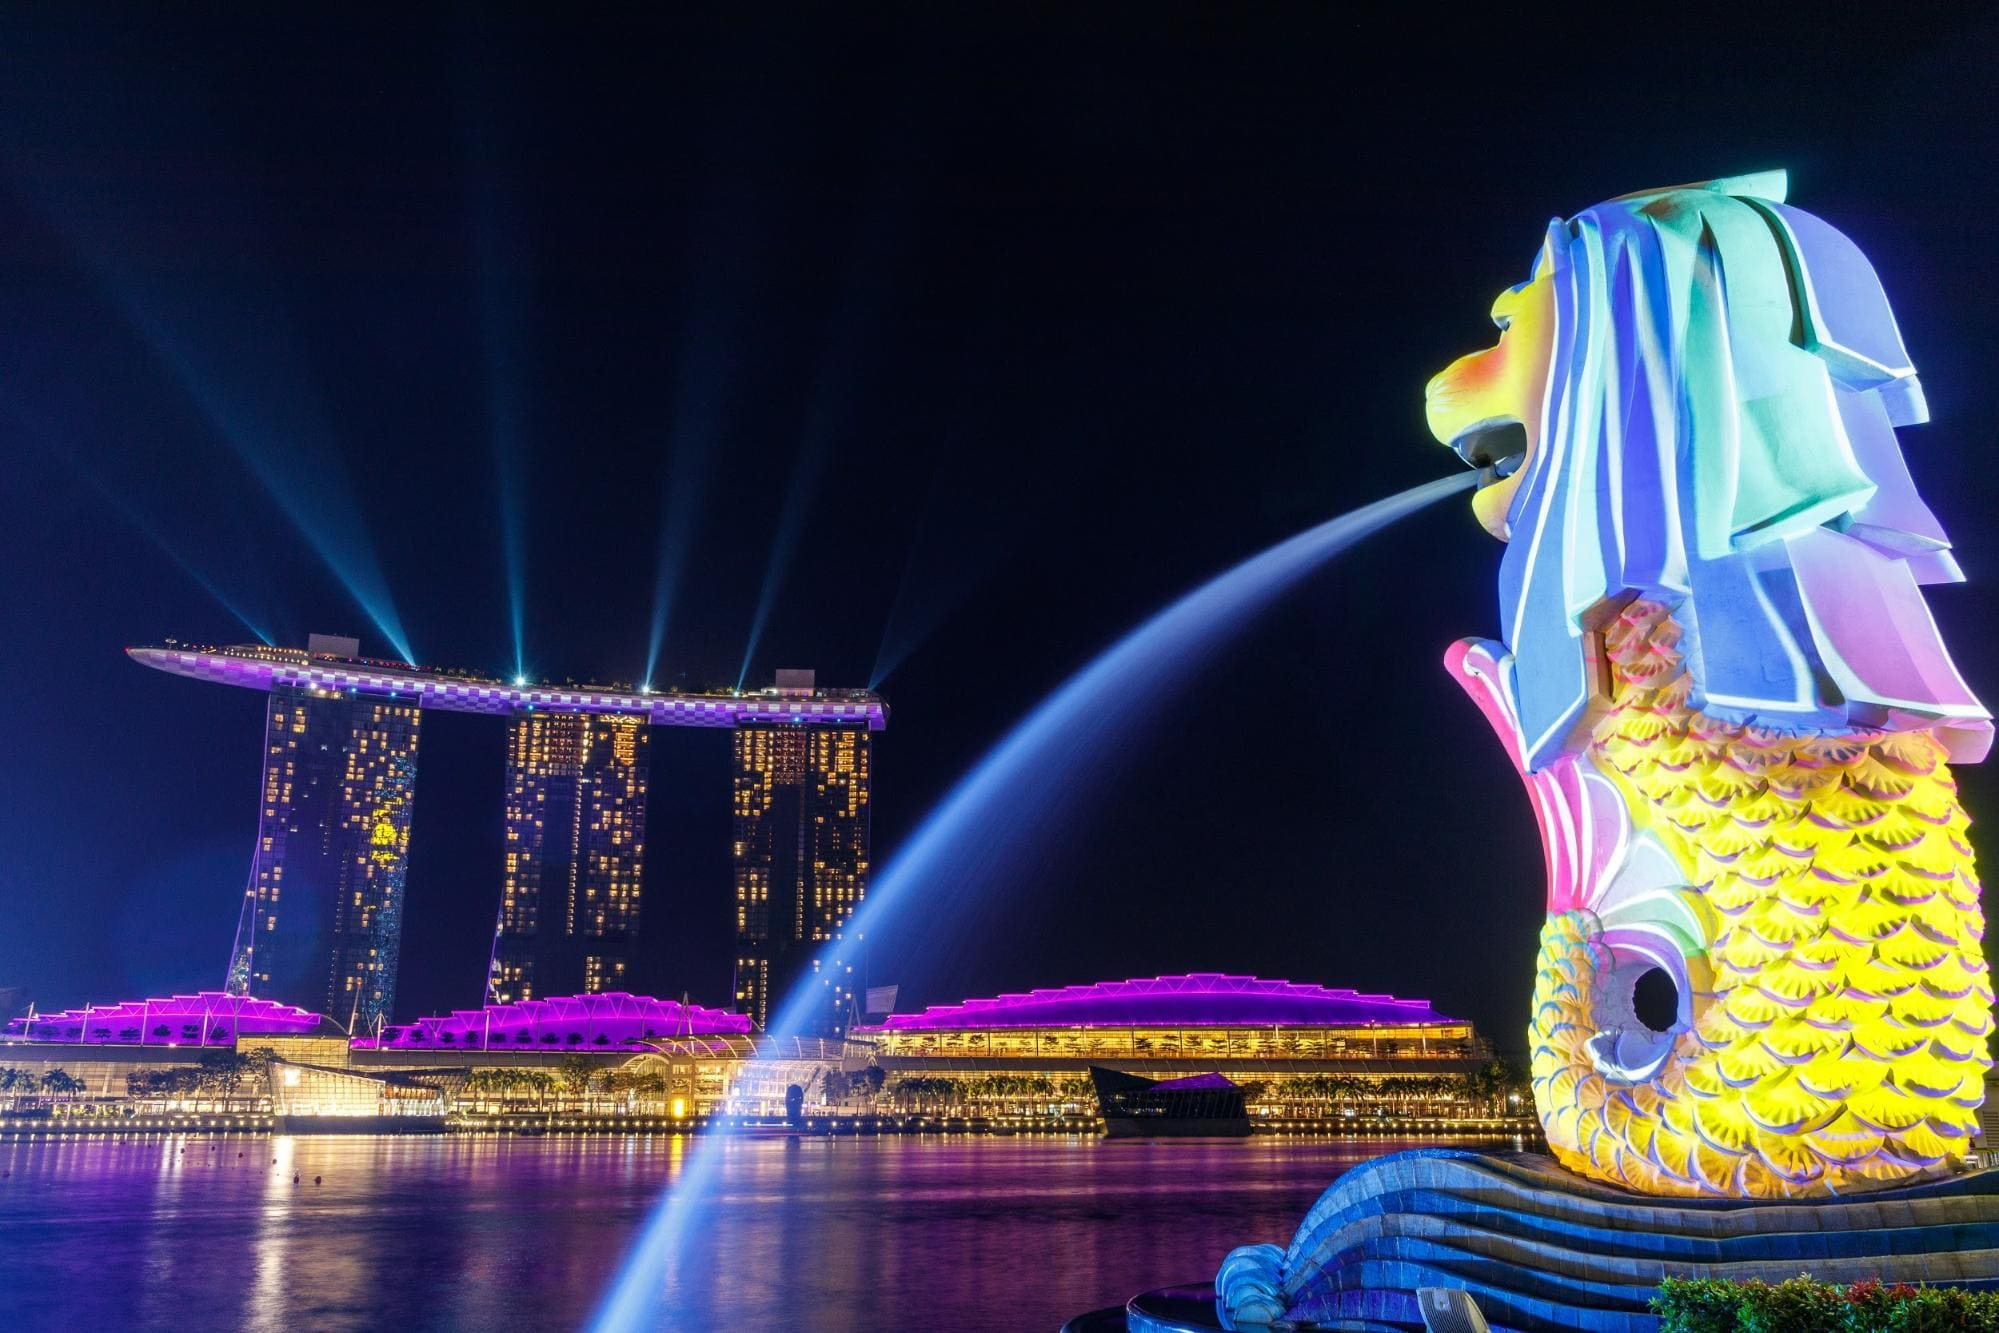 singapore photography spots